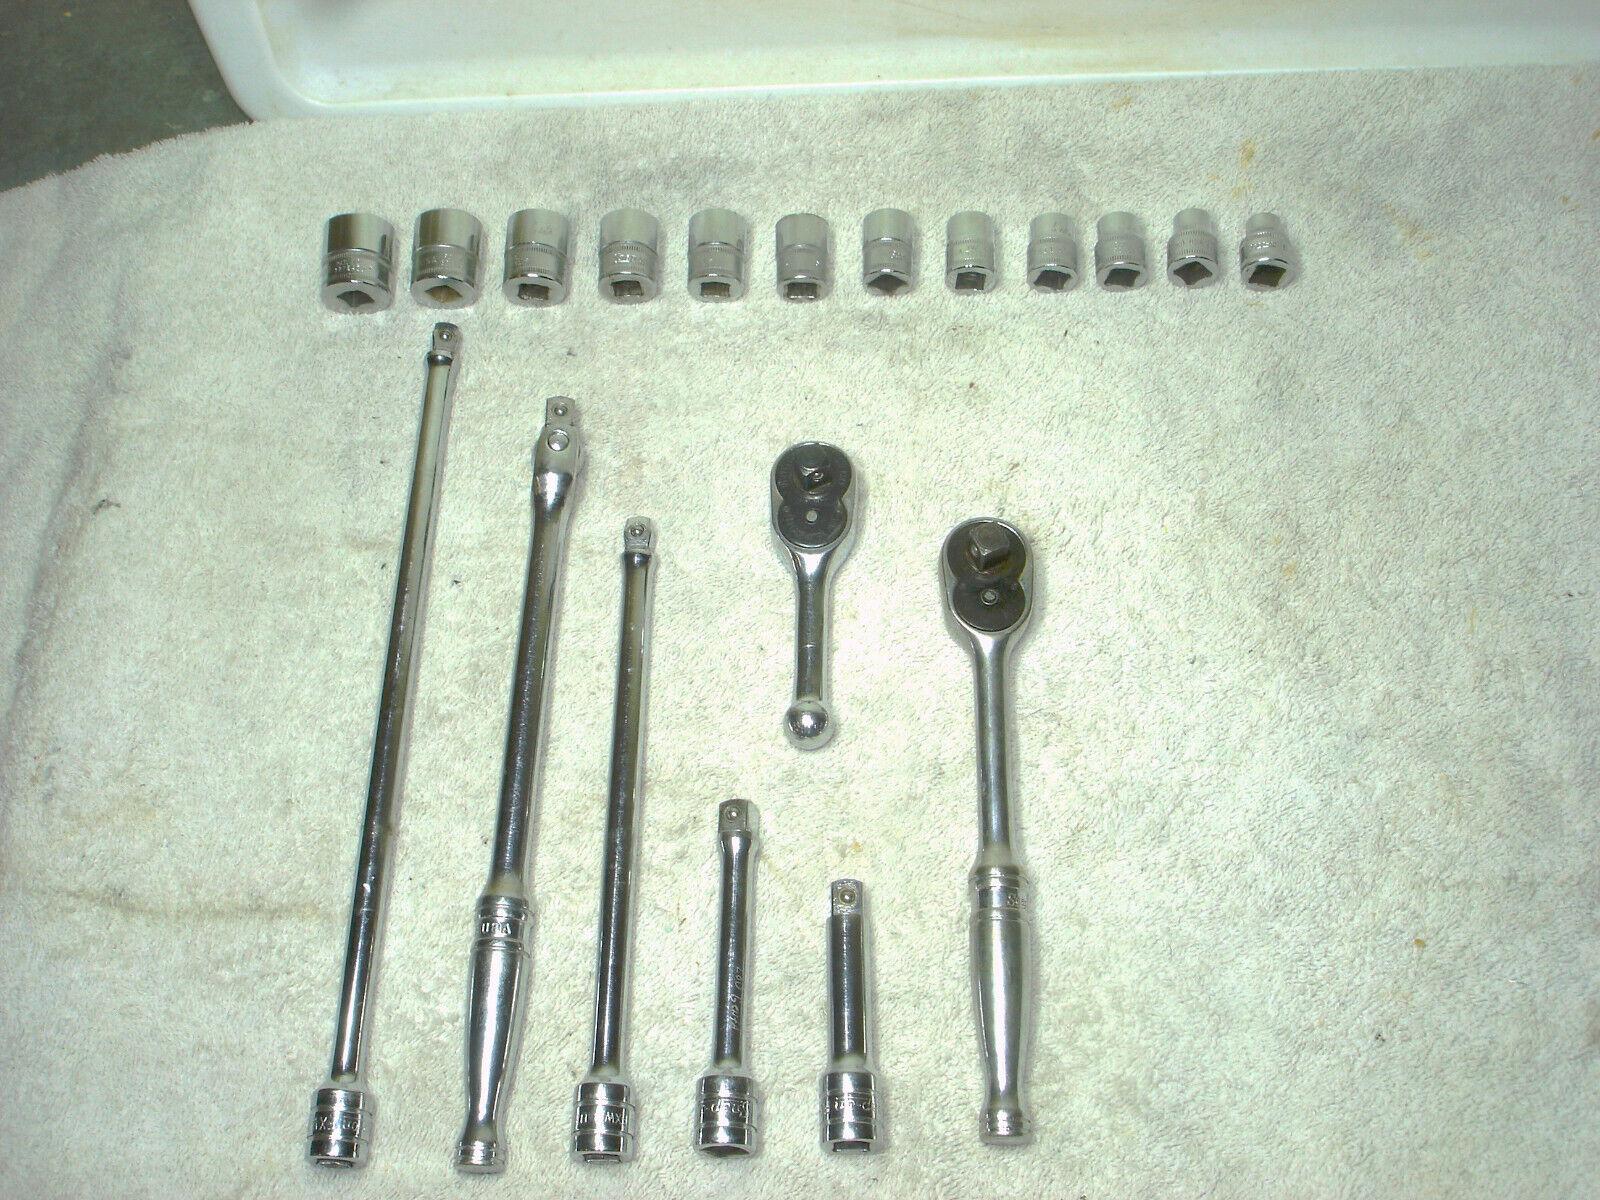 19 Pc. Lot Snap On 12 Point Metric Socket / Ratchet Set  3/8 Drive + Exstensions